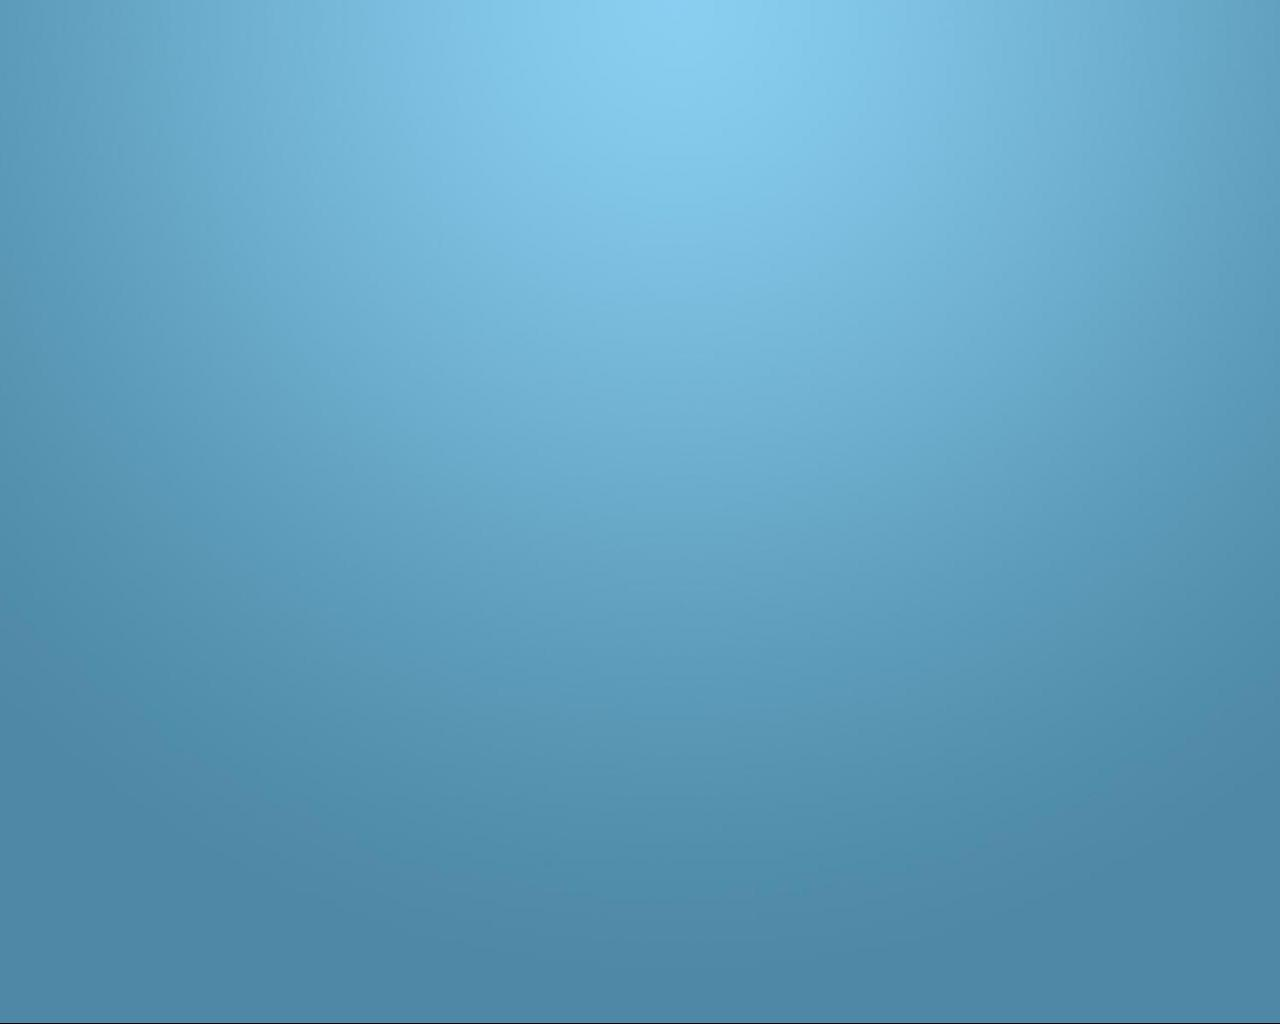 Baby Blue Windows 7 Desktop Wallpaper Baby Blue Wallpapers 1280x1024